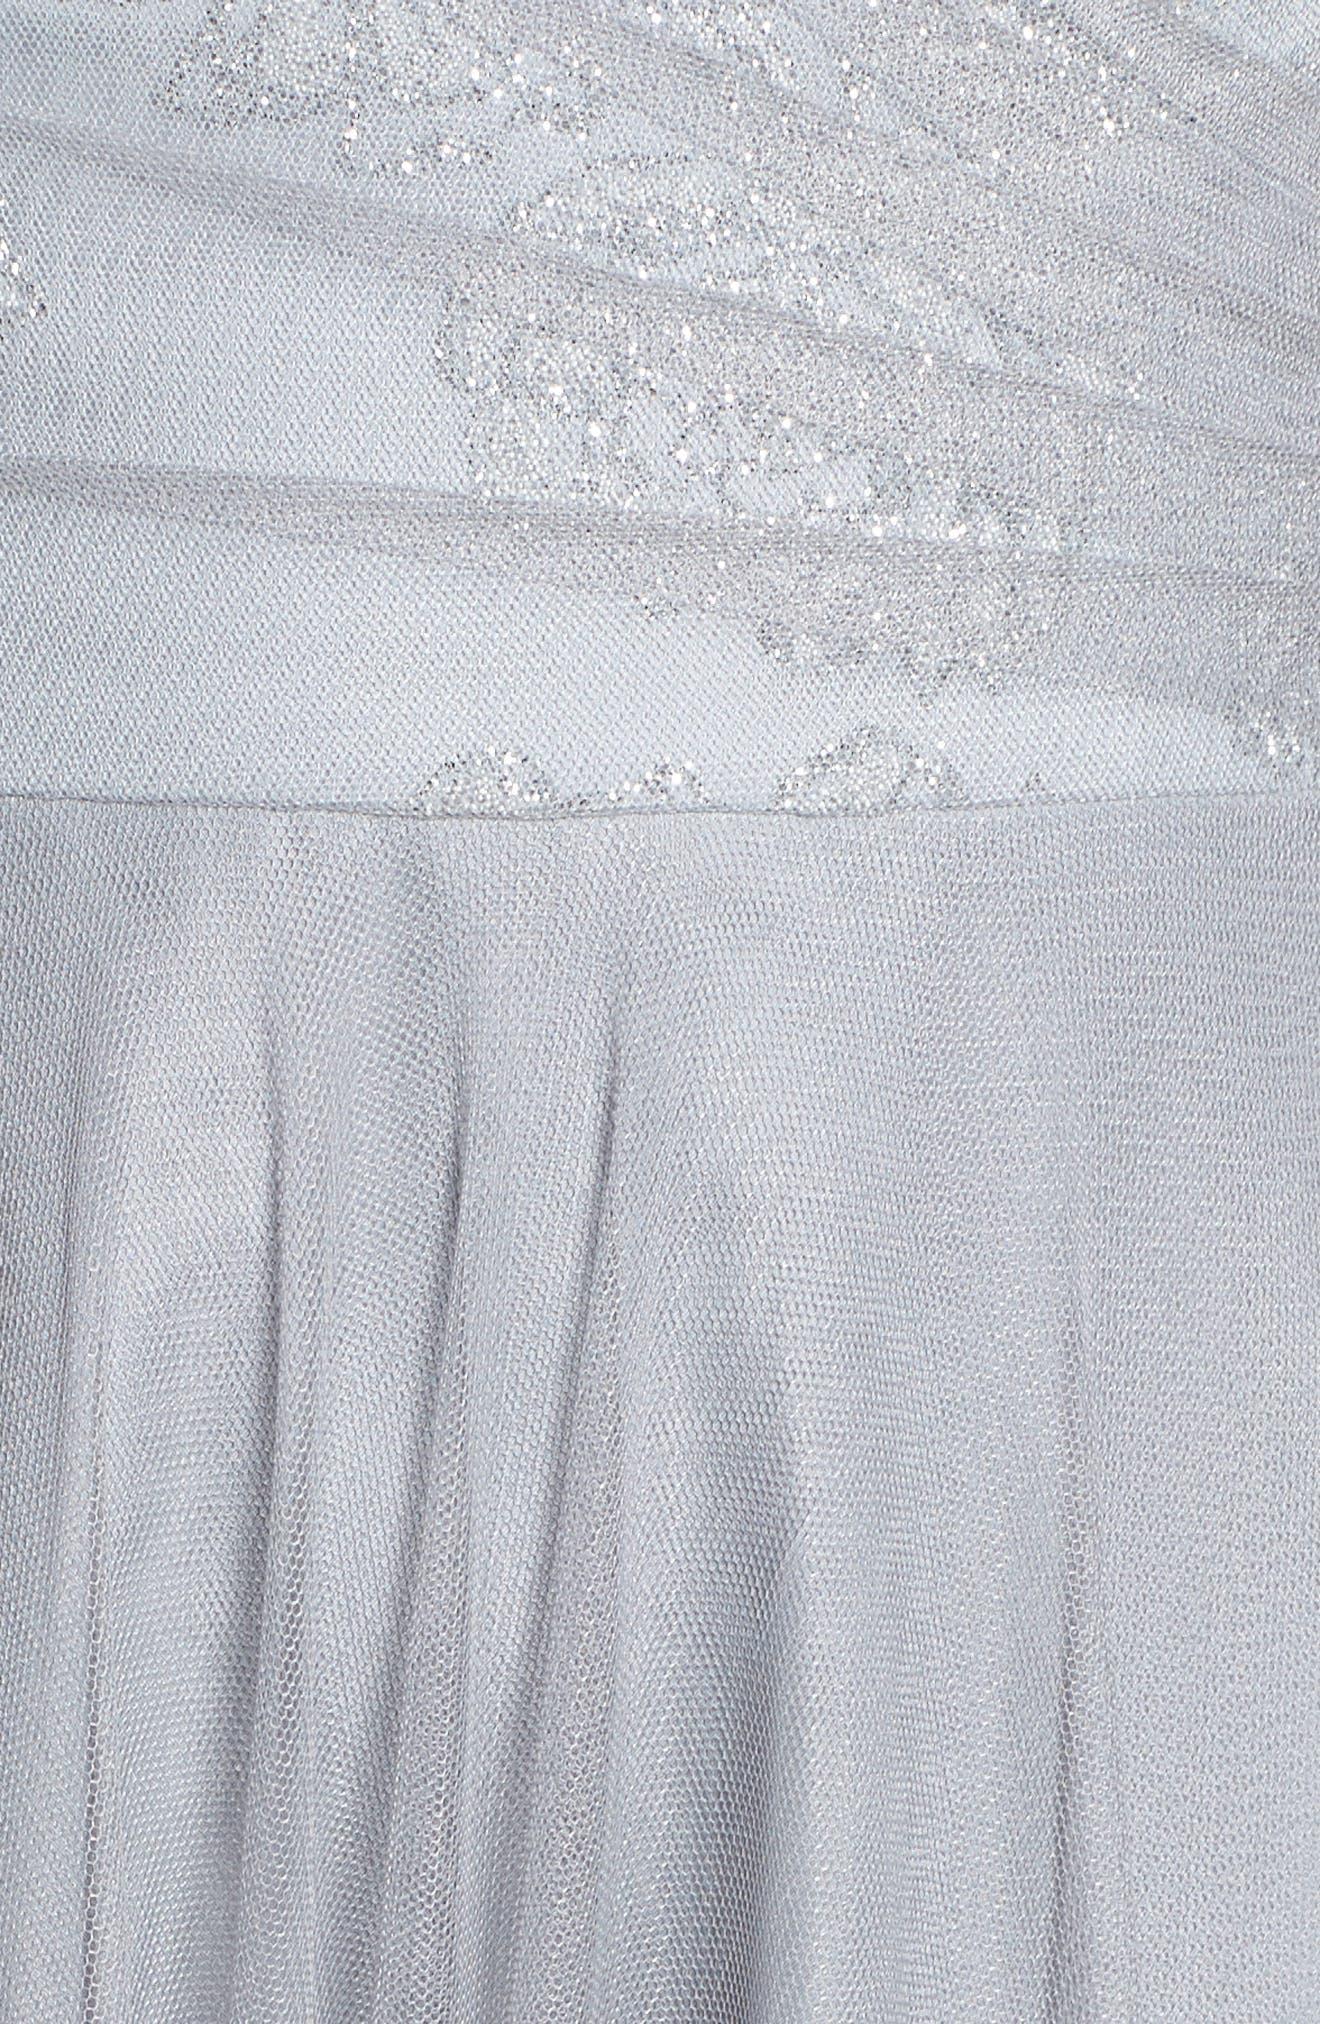 Embellished Bodice Net Halter Gown,                             Alternate thumbnail 6, color,                             PEWTER